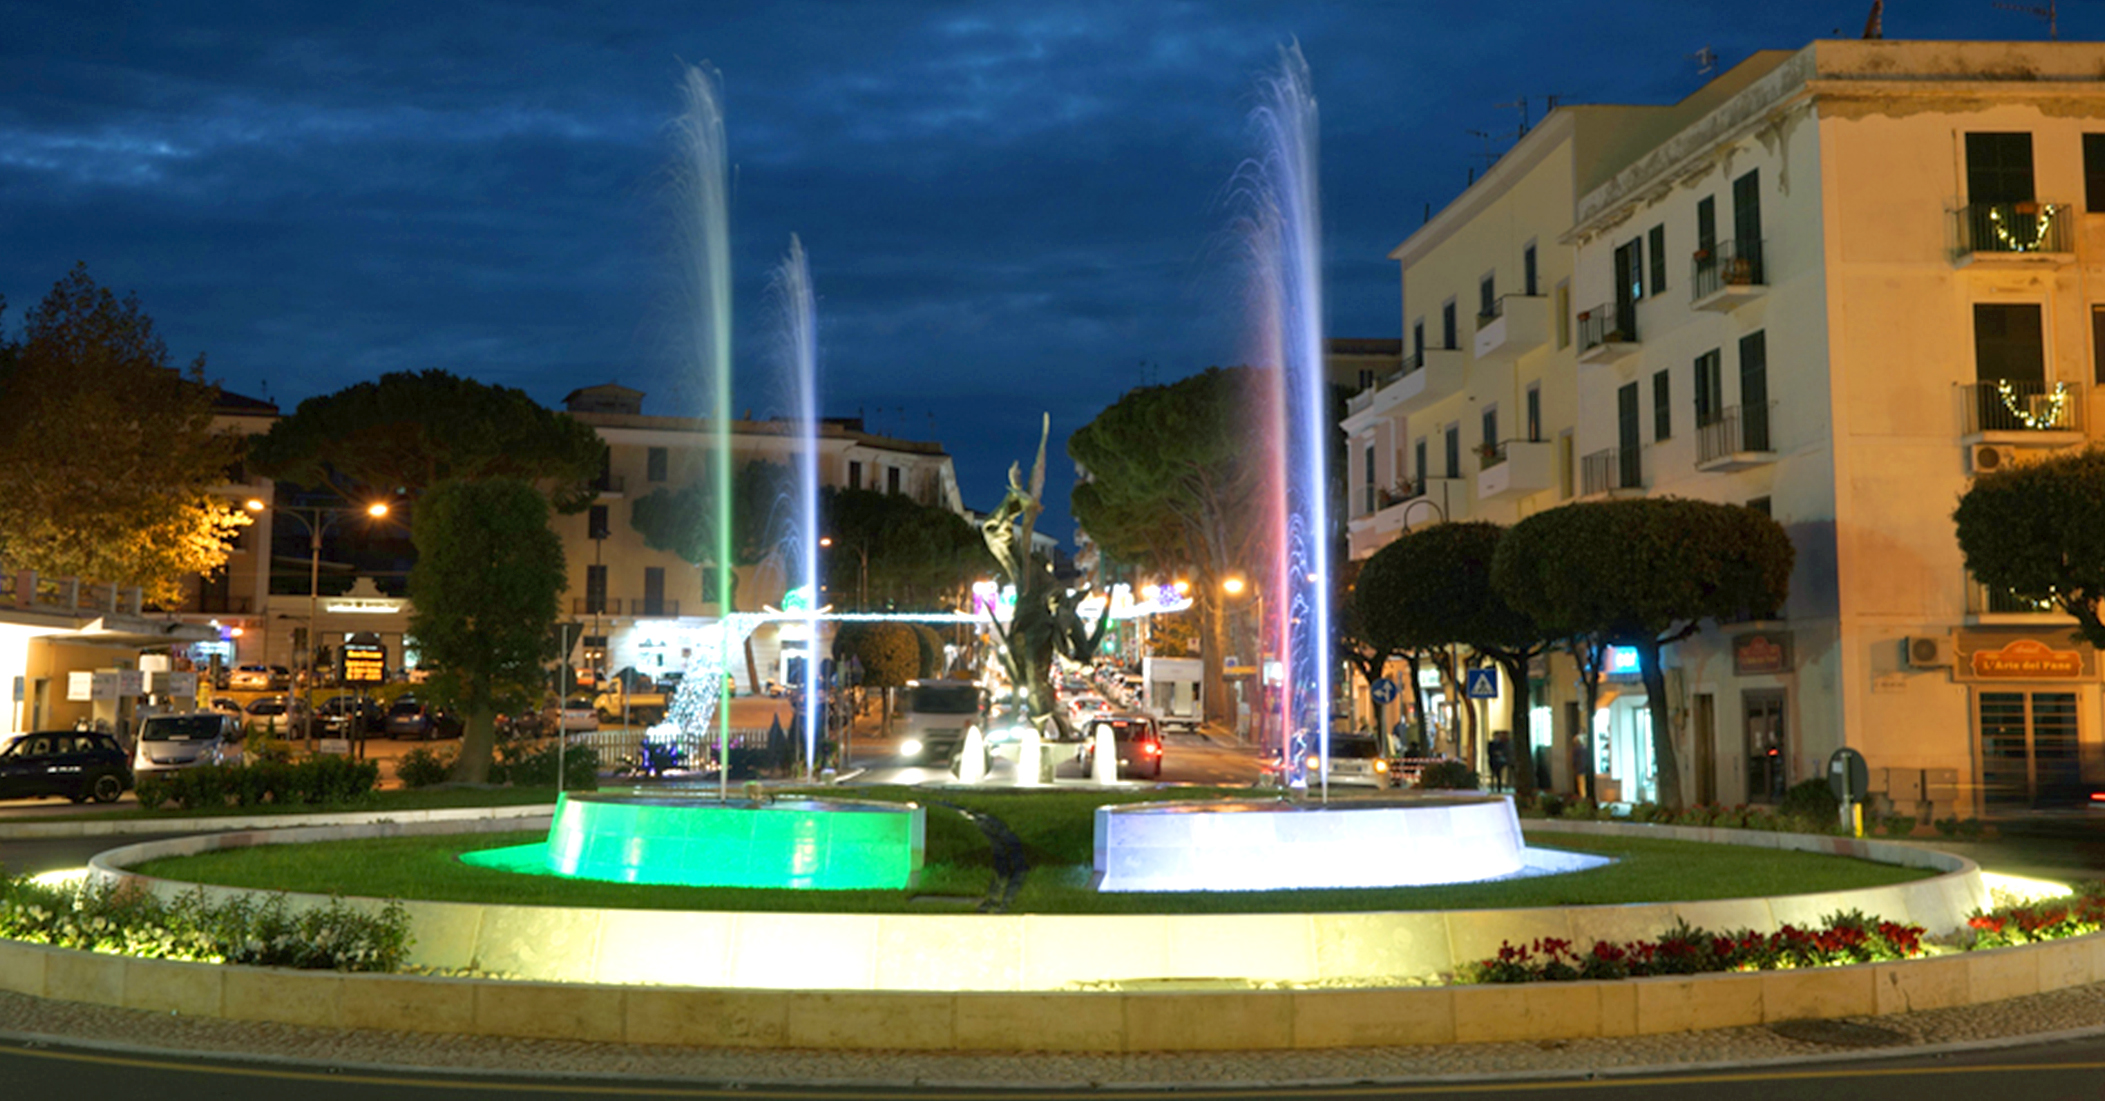 14_fontana_monumentale_gaeta_architetto_davide_di_cola_ldcarchitettura_891x466